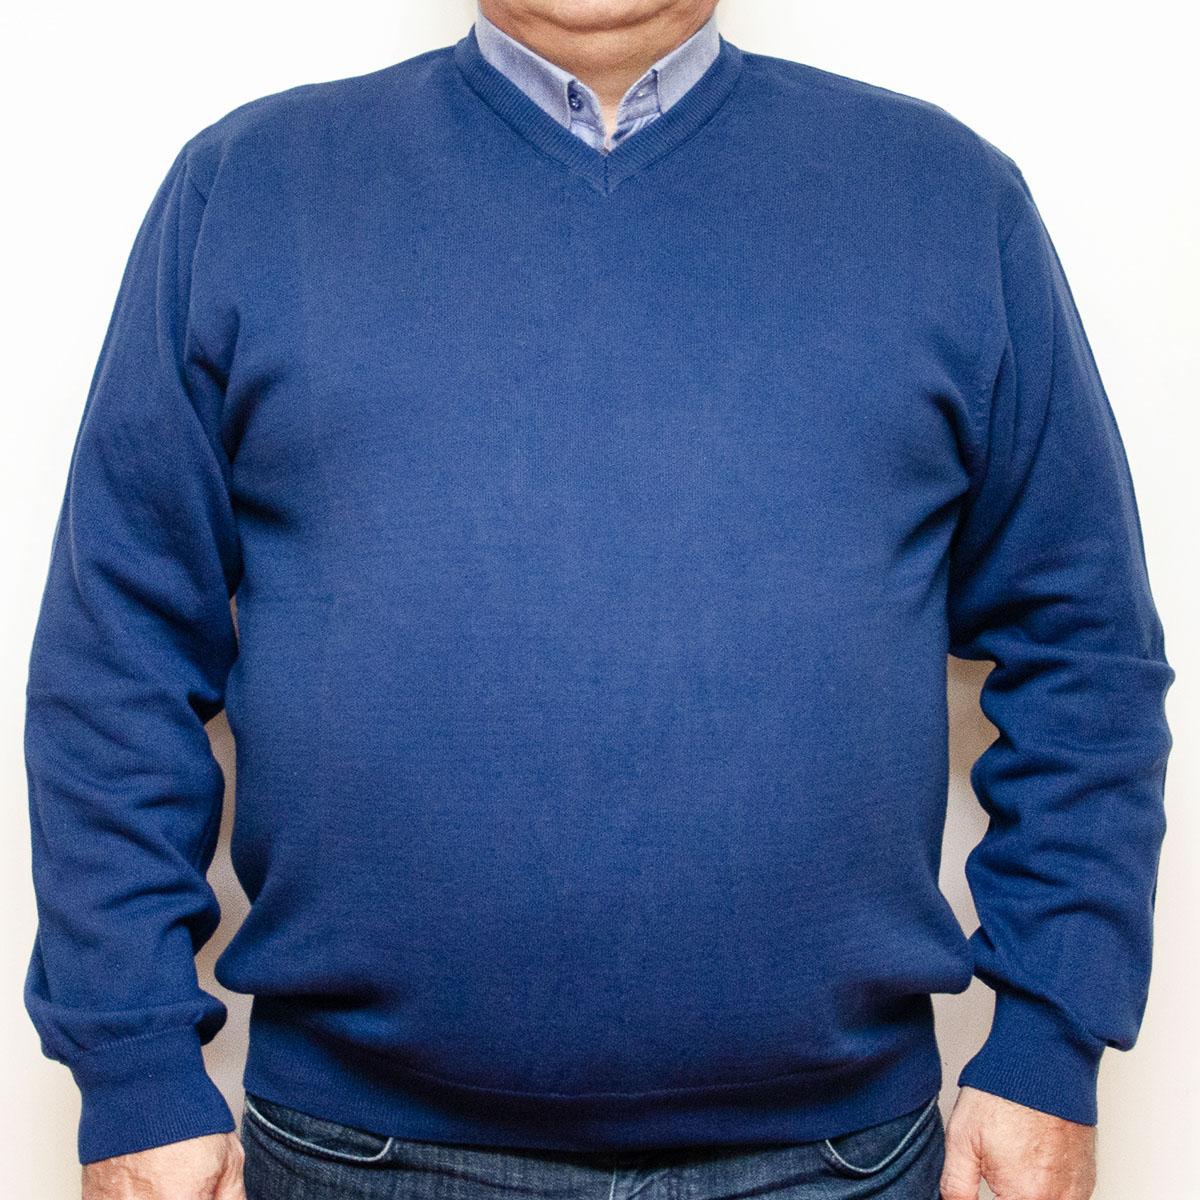 Pulover albastru cu anchior , Marime 4XL - egato.ro